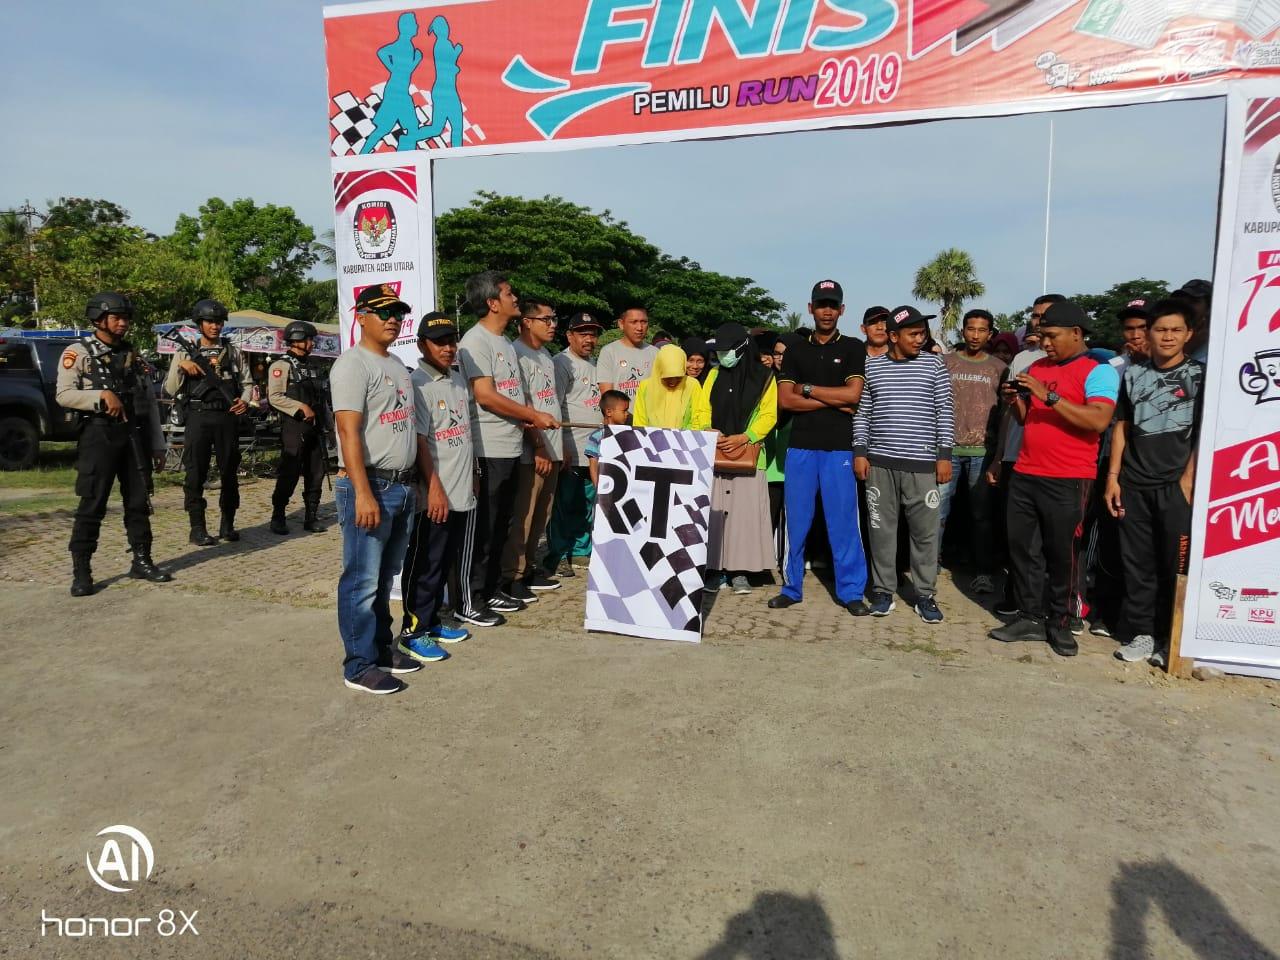 Amankan Pemilu Run di Lhoksukon, Polres Aceh Utara Kerahkan Puluhan Personel